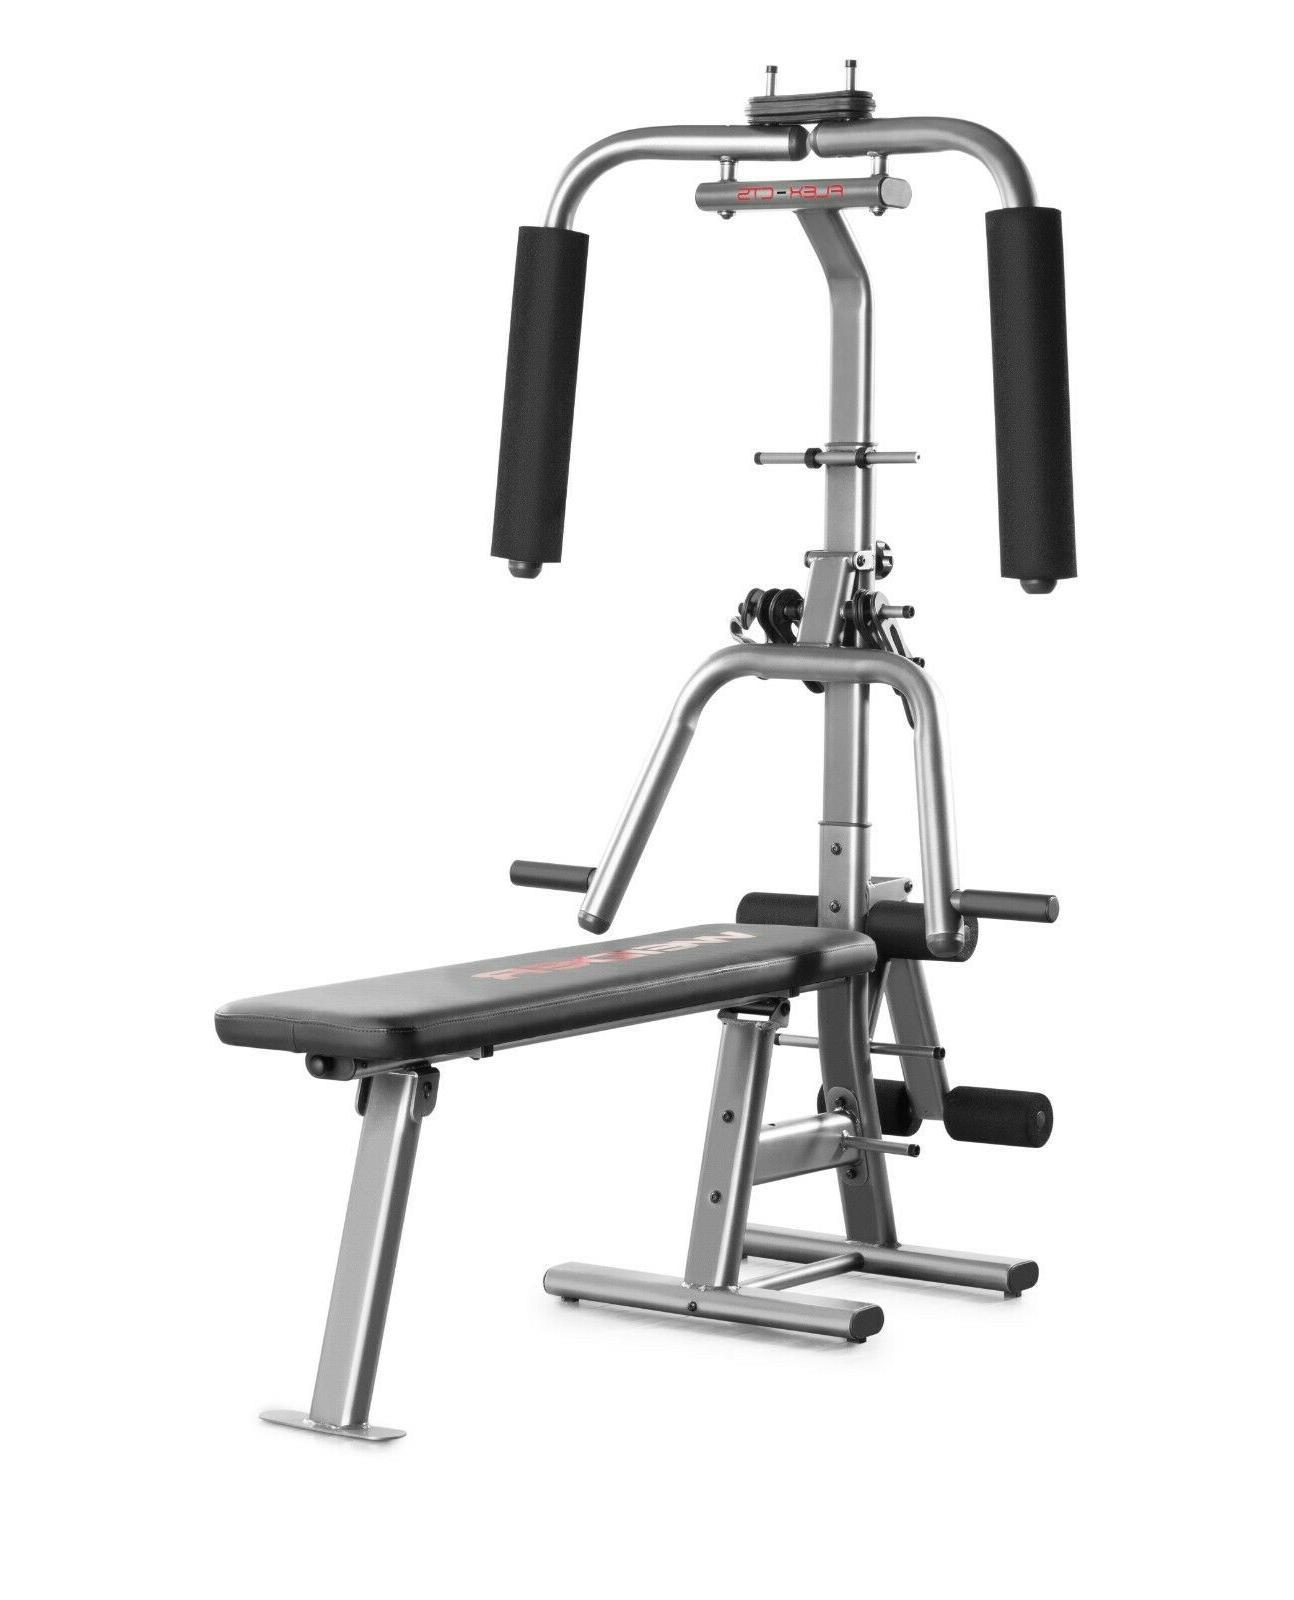 Weider Flex CTS Home Gym System | WESY20318